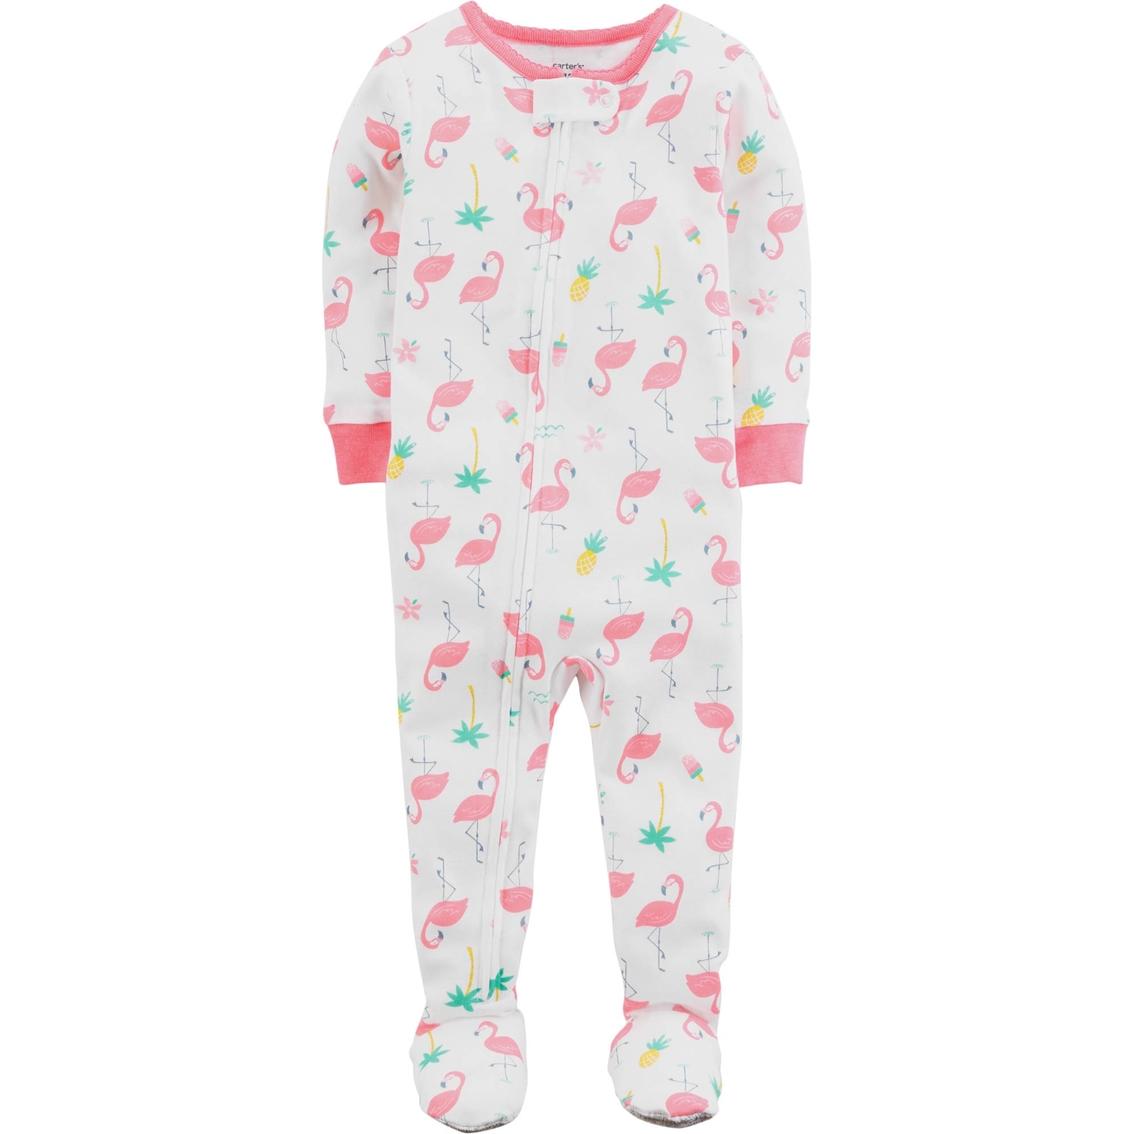 4b16d25ec8ec Carter s Infant Girls 1 Pc. Snug Fit Flamingo Pajamas